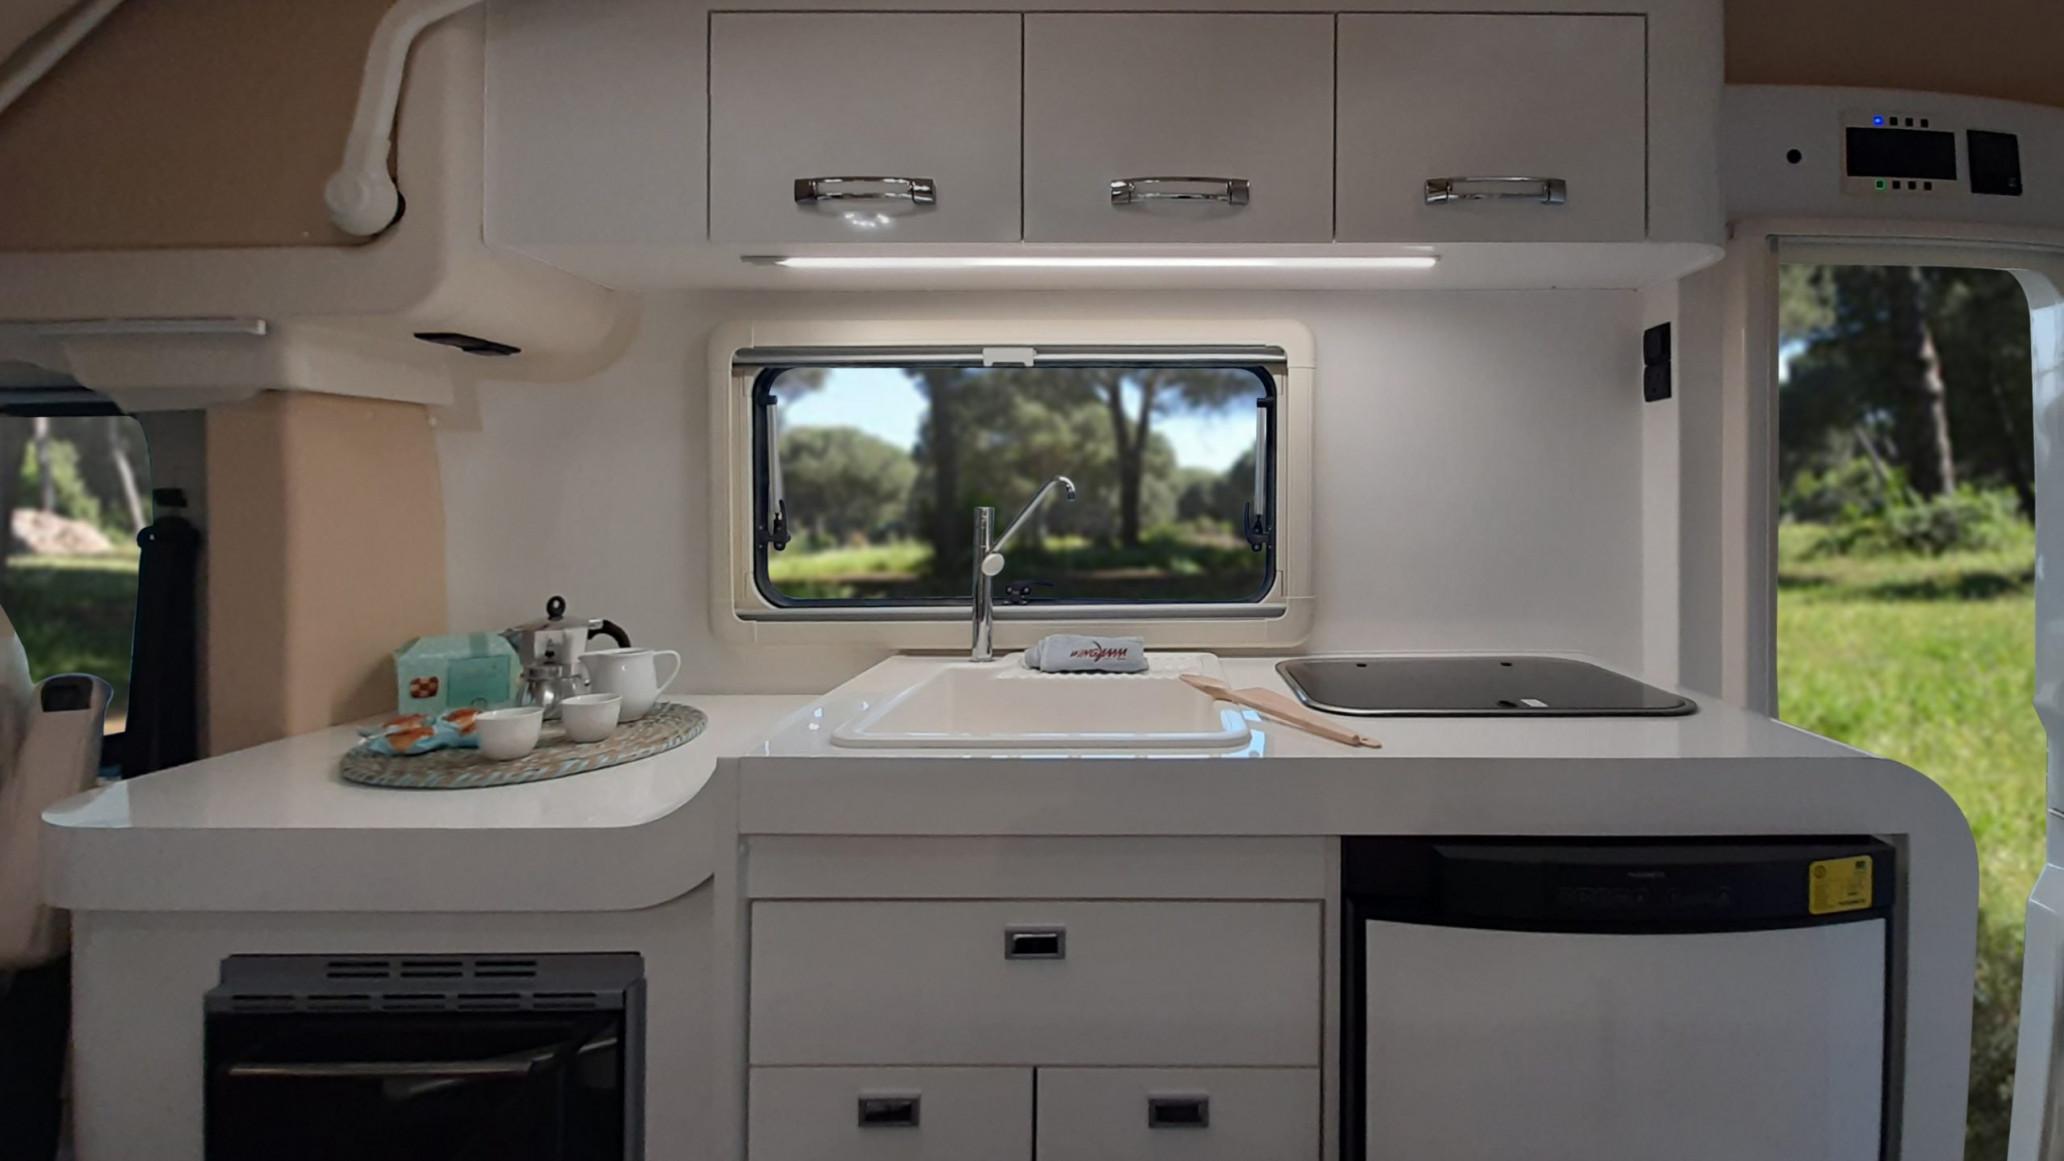 20201127_150635 - camping-car